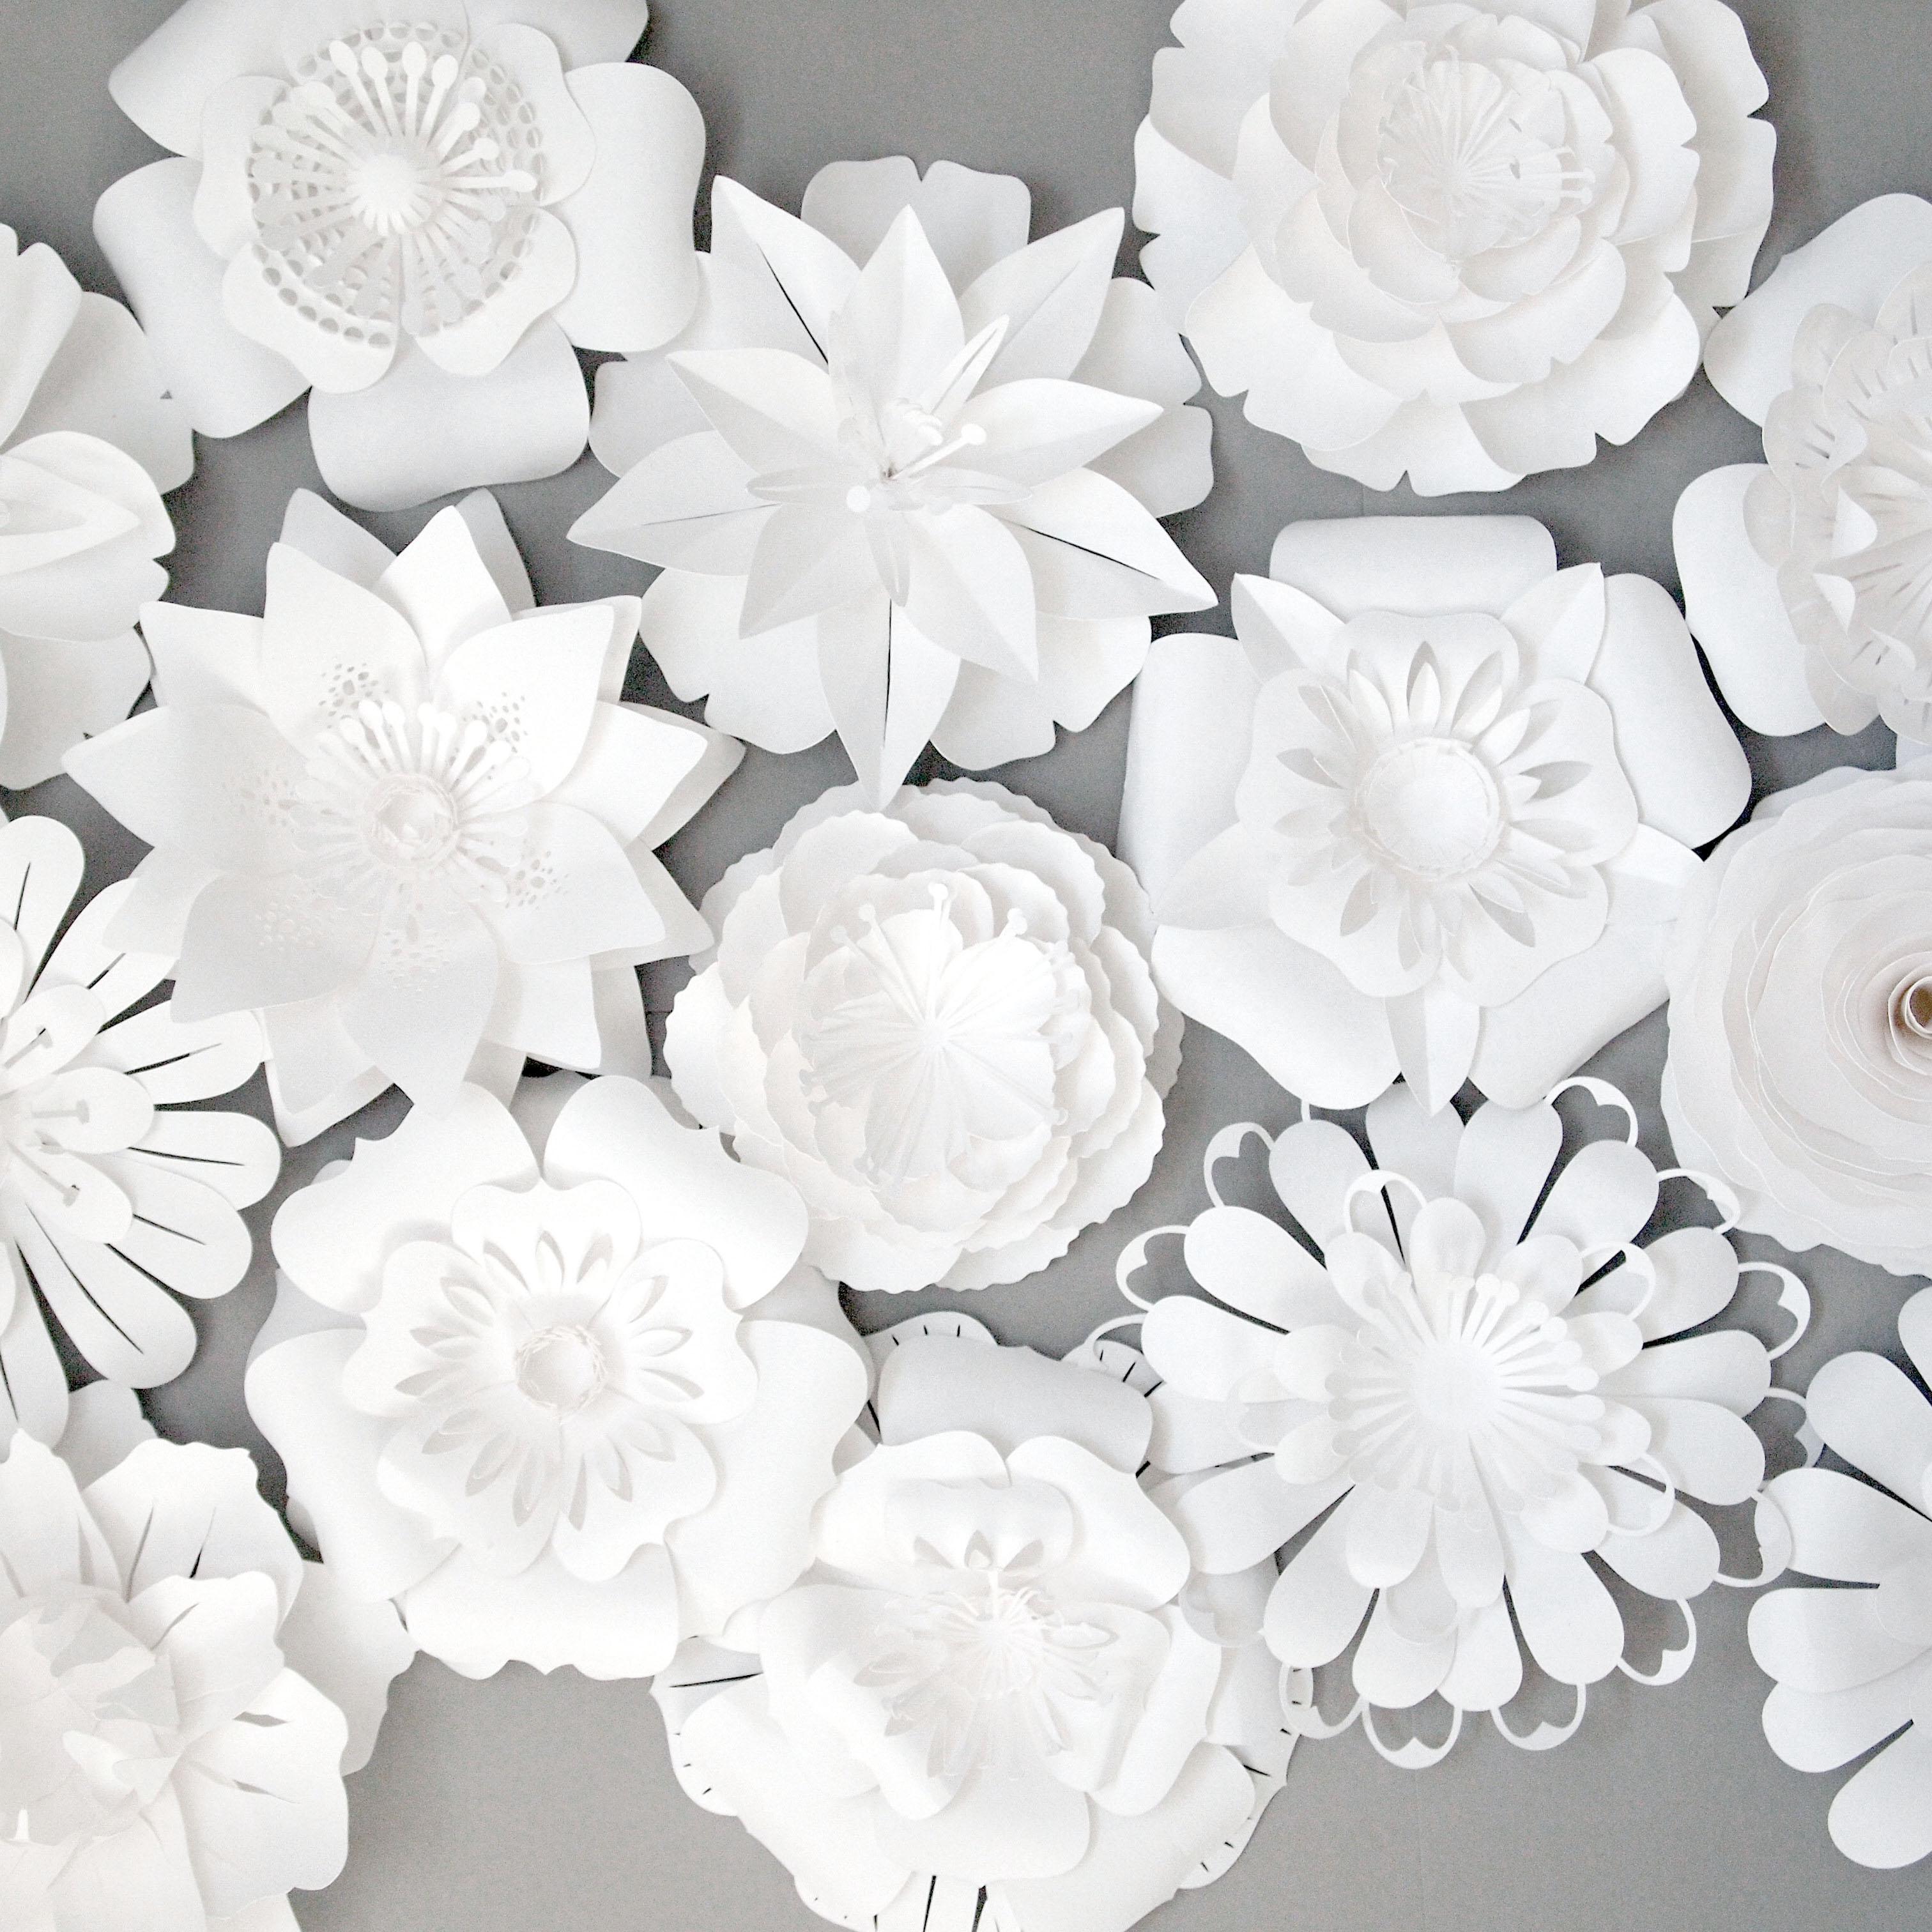 Paper flowers sarah louise matthews papercut white paper flowers mightylinksfo